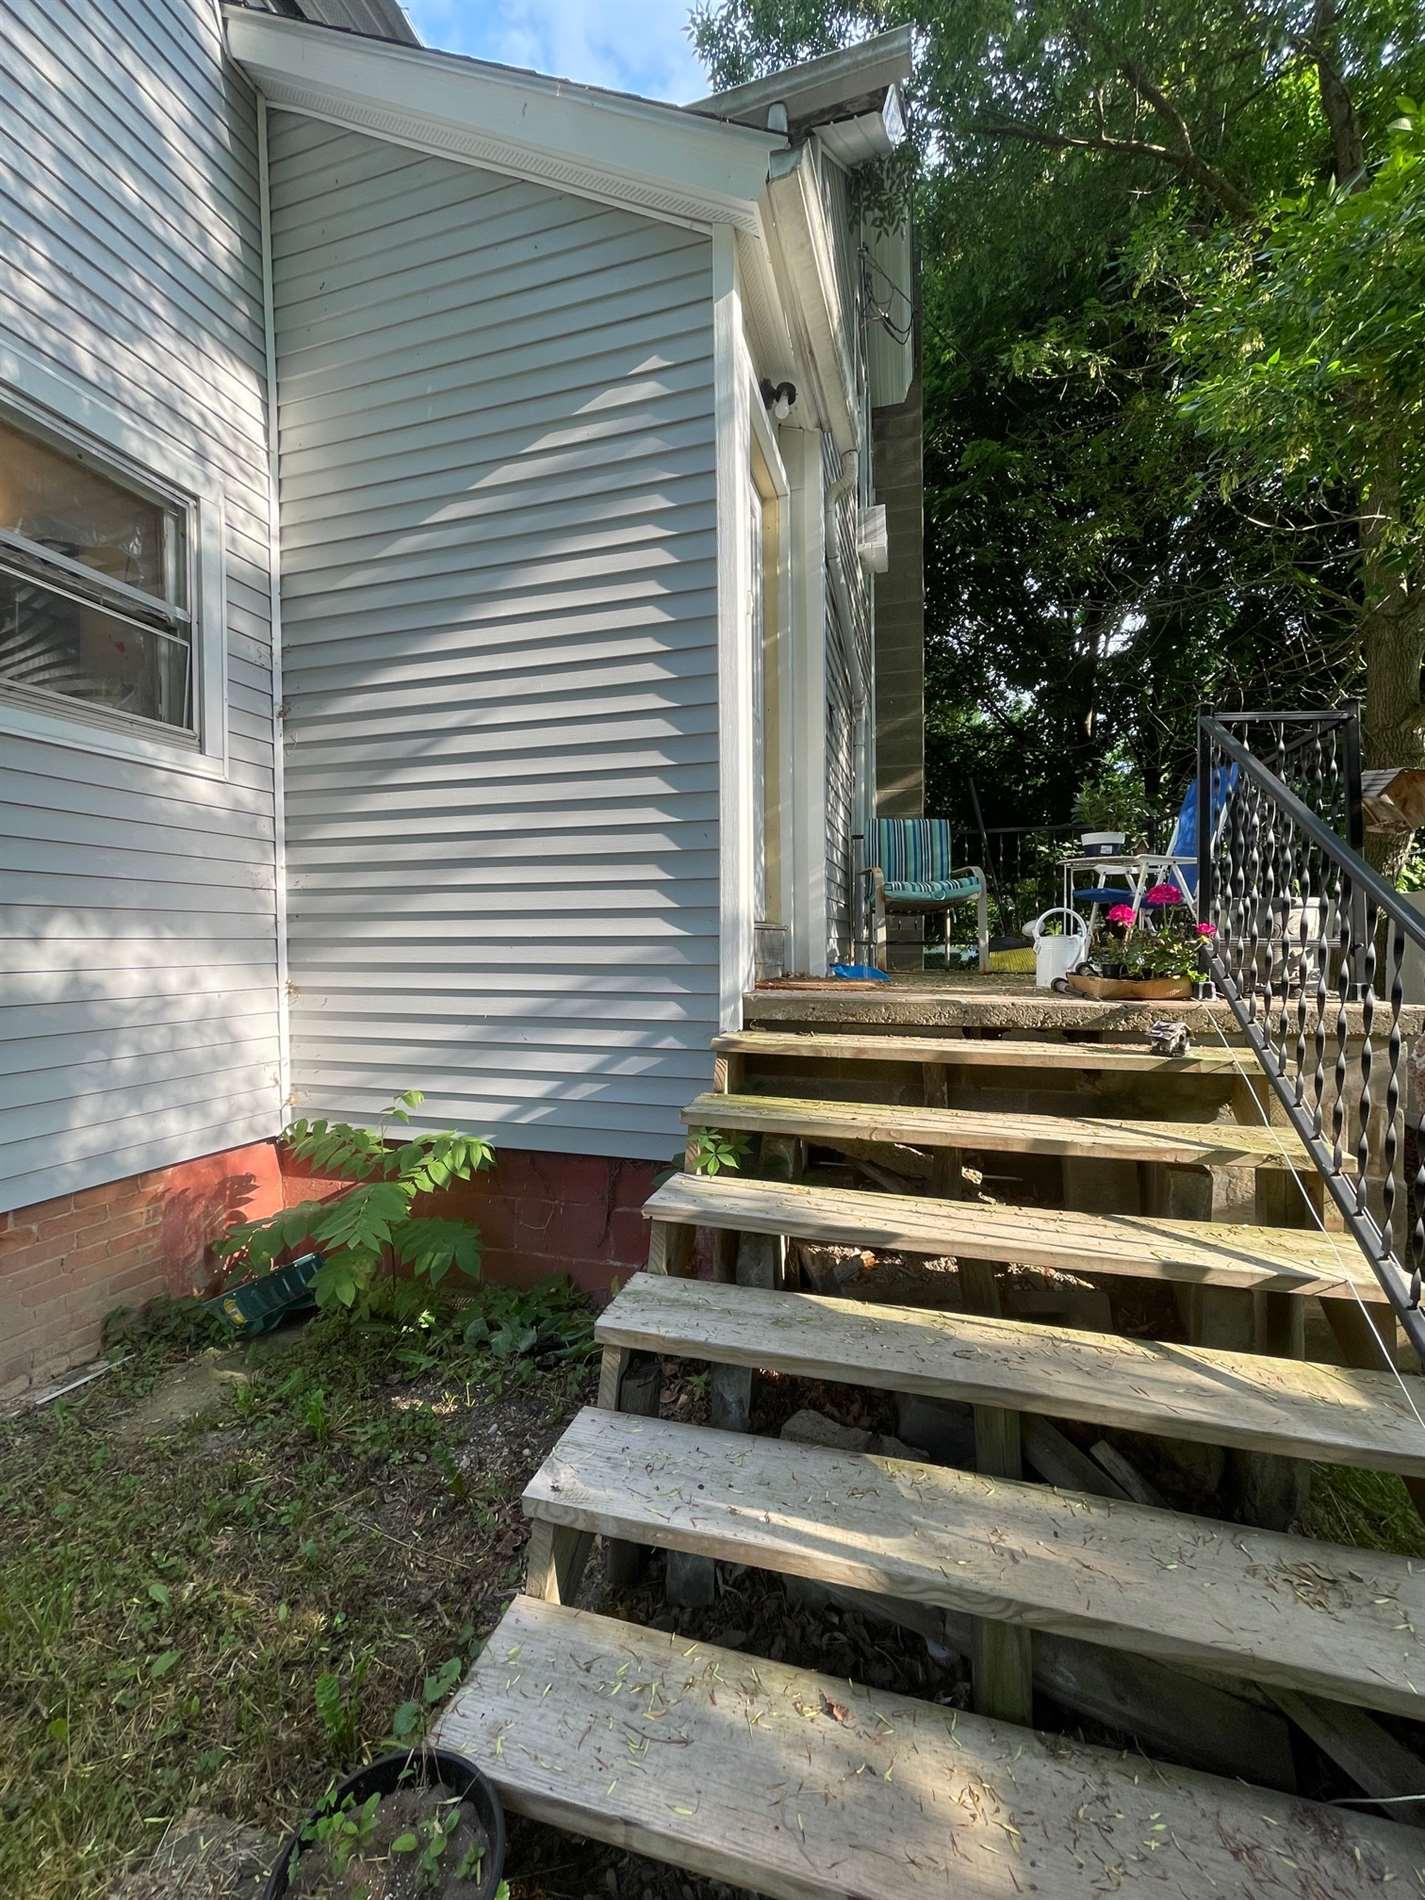 803 E State Street, St. Johns, MI 48879